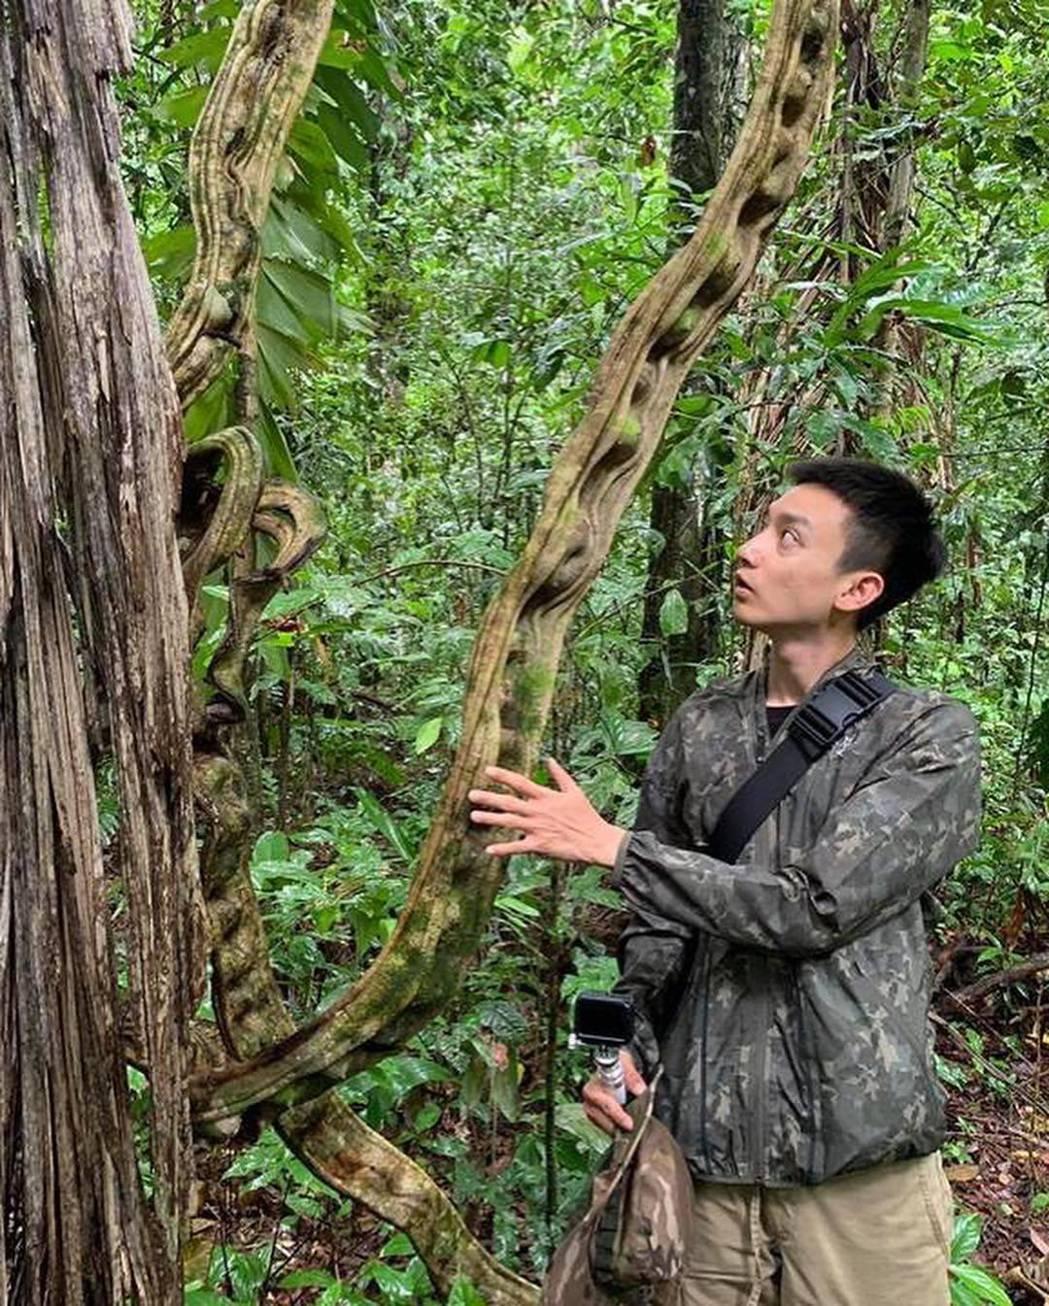 Eason深入亞馬遜叢林探險。圖/摘自IG